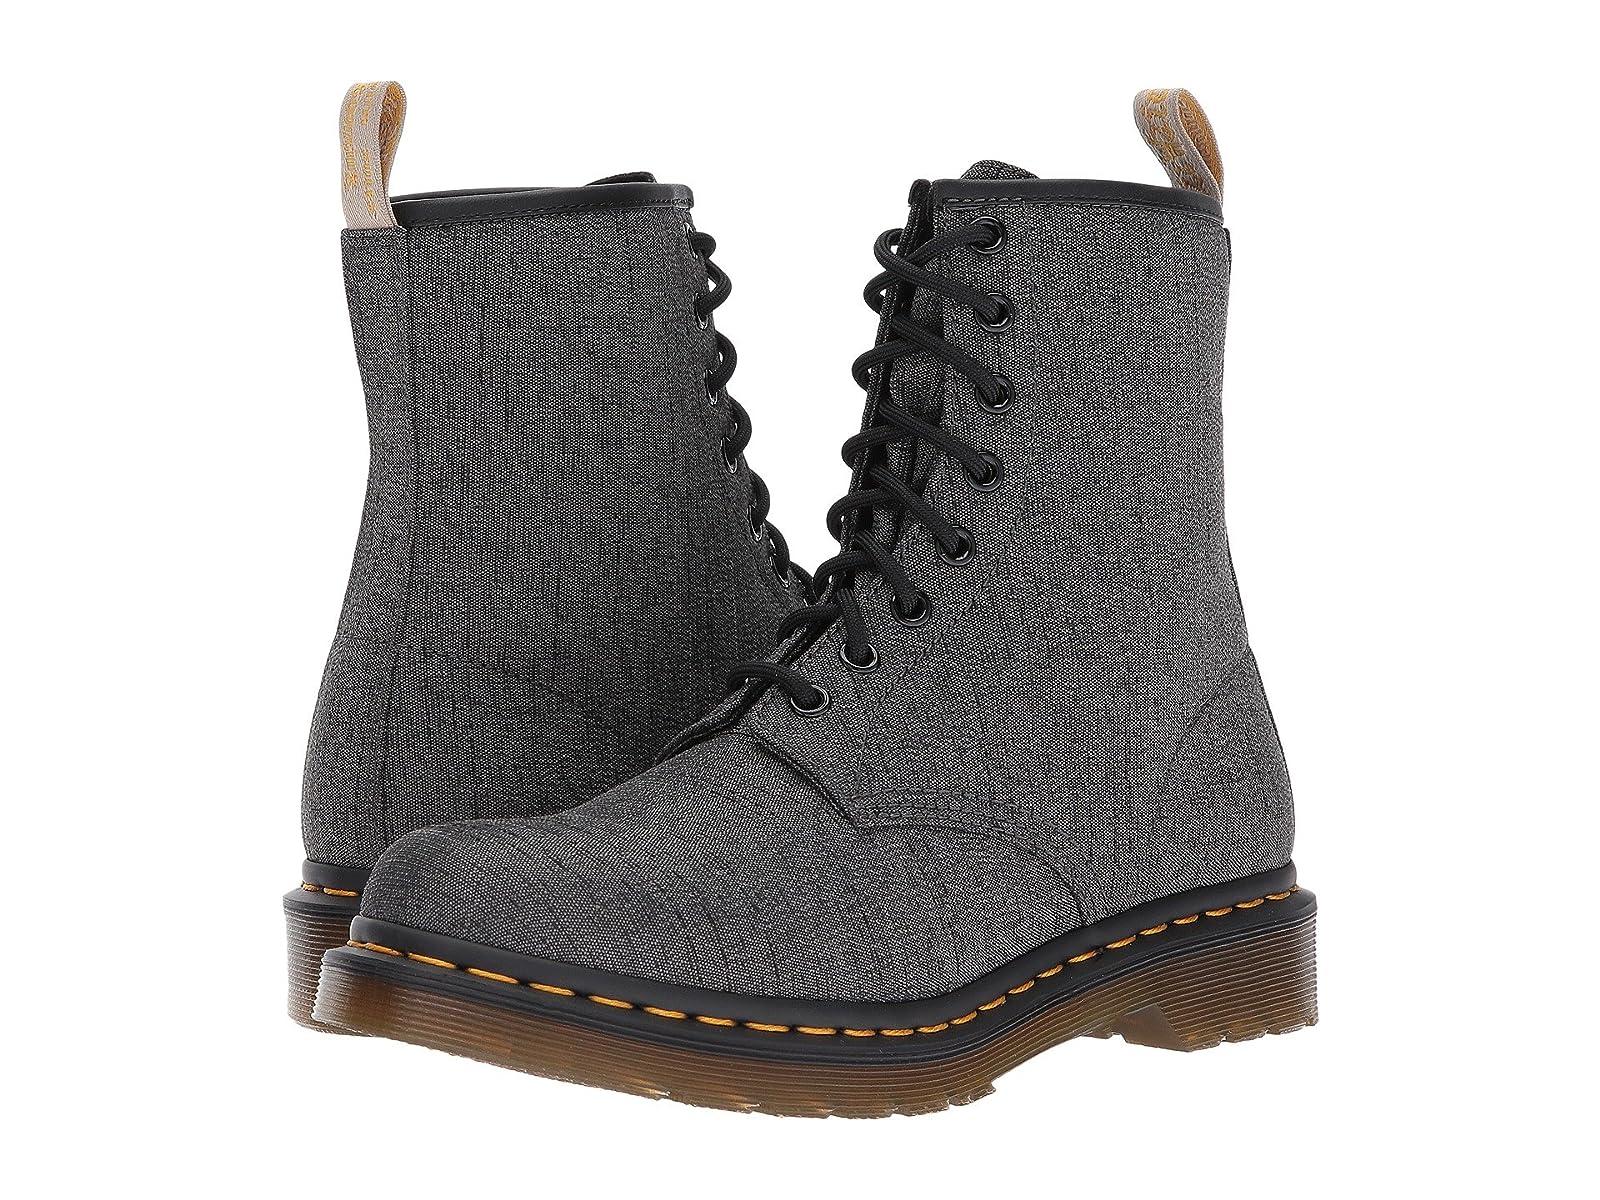 Dr. Martens Vegan Castel 8-Eye BootCheap and distinctive eye-catching shoes